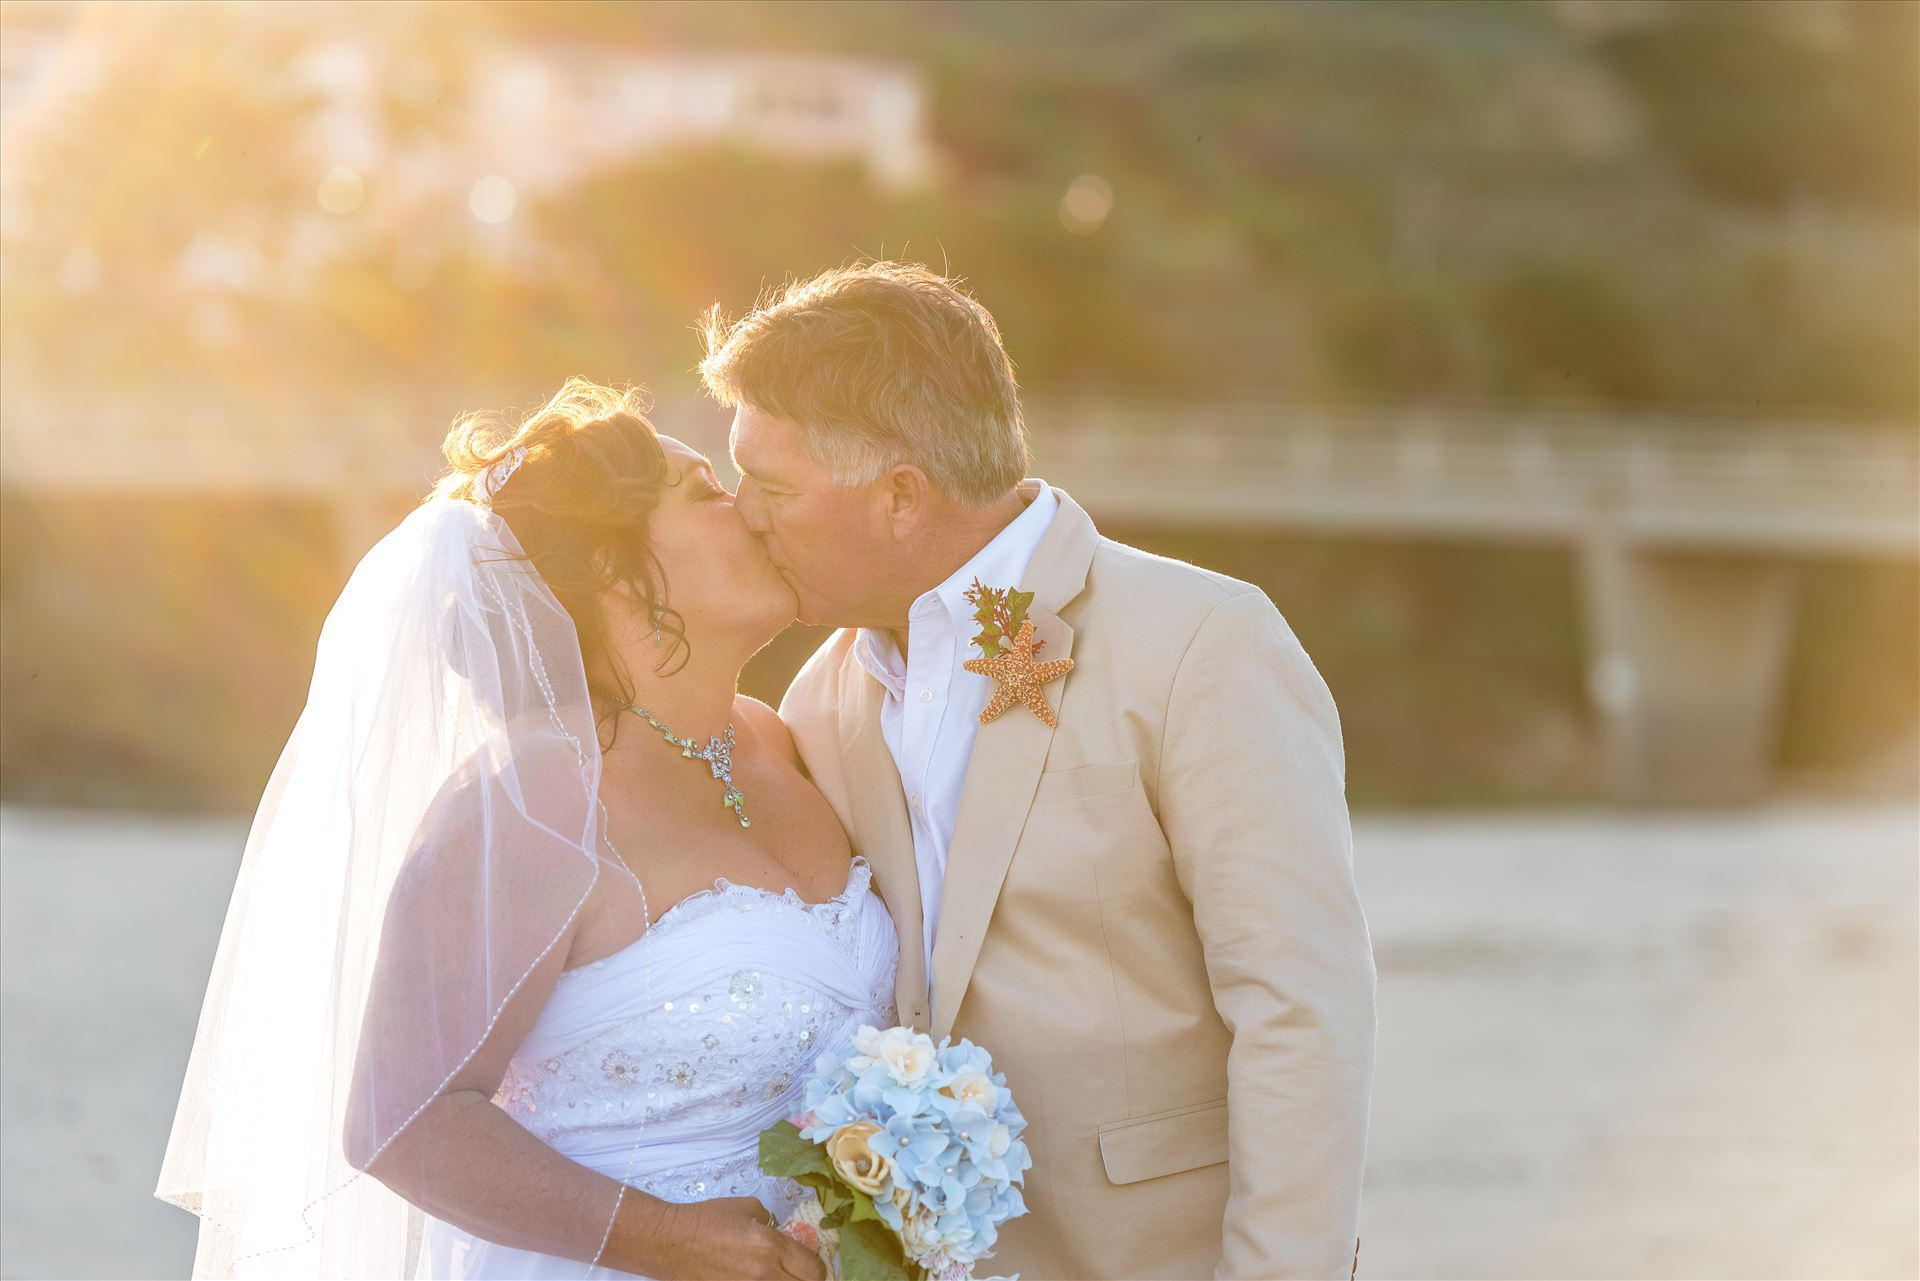 Ross Beach Wedding 13  by Sarah Williams